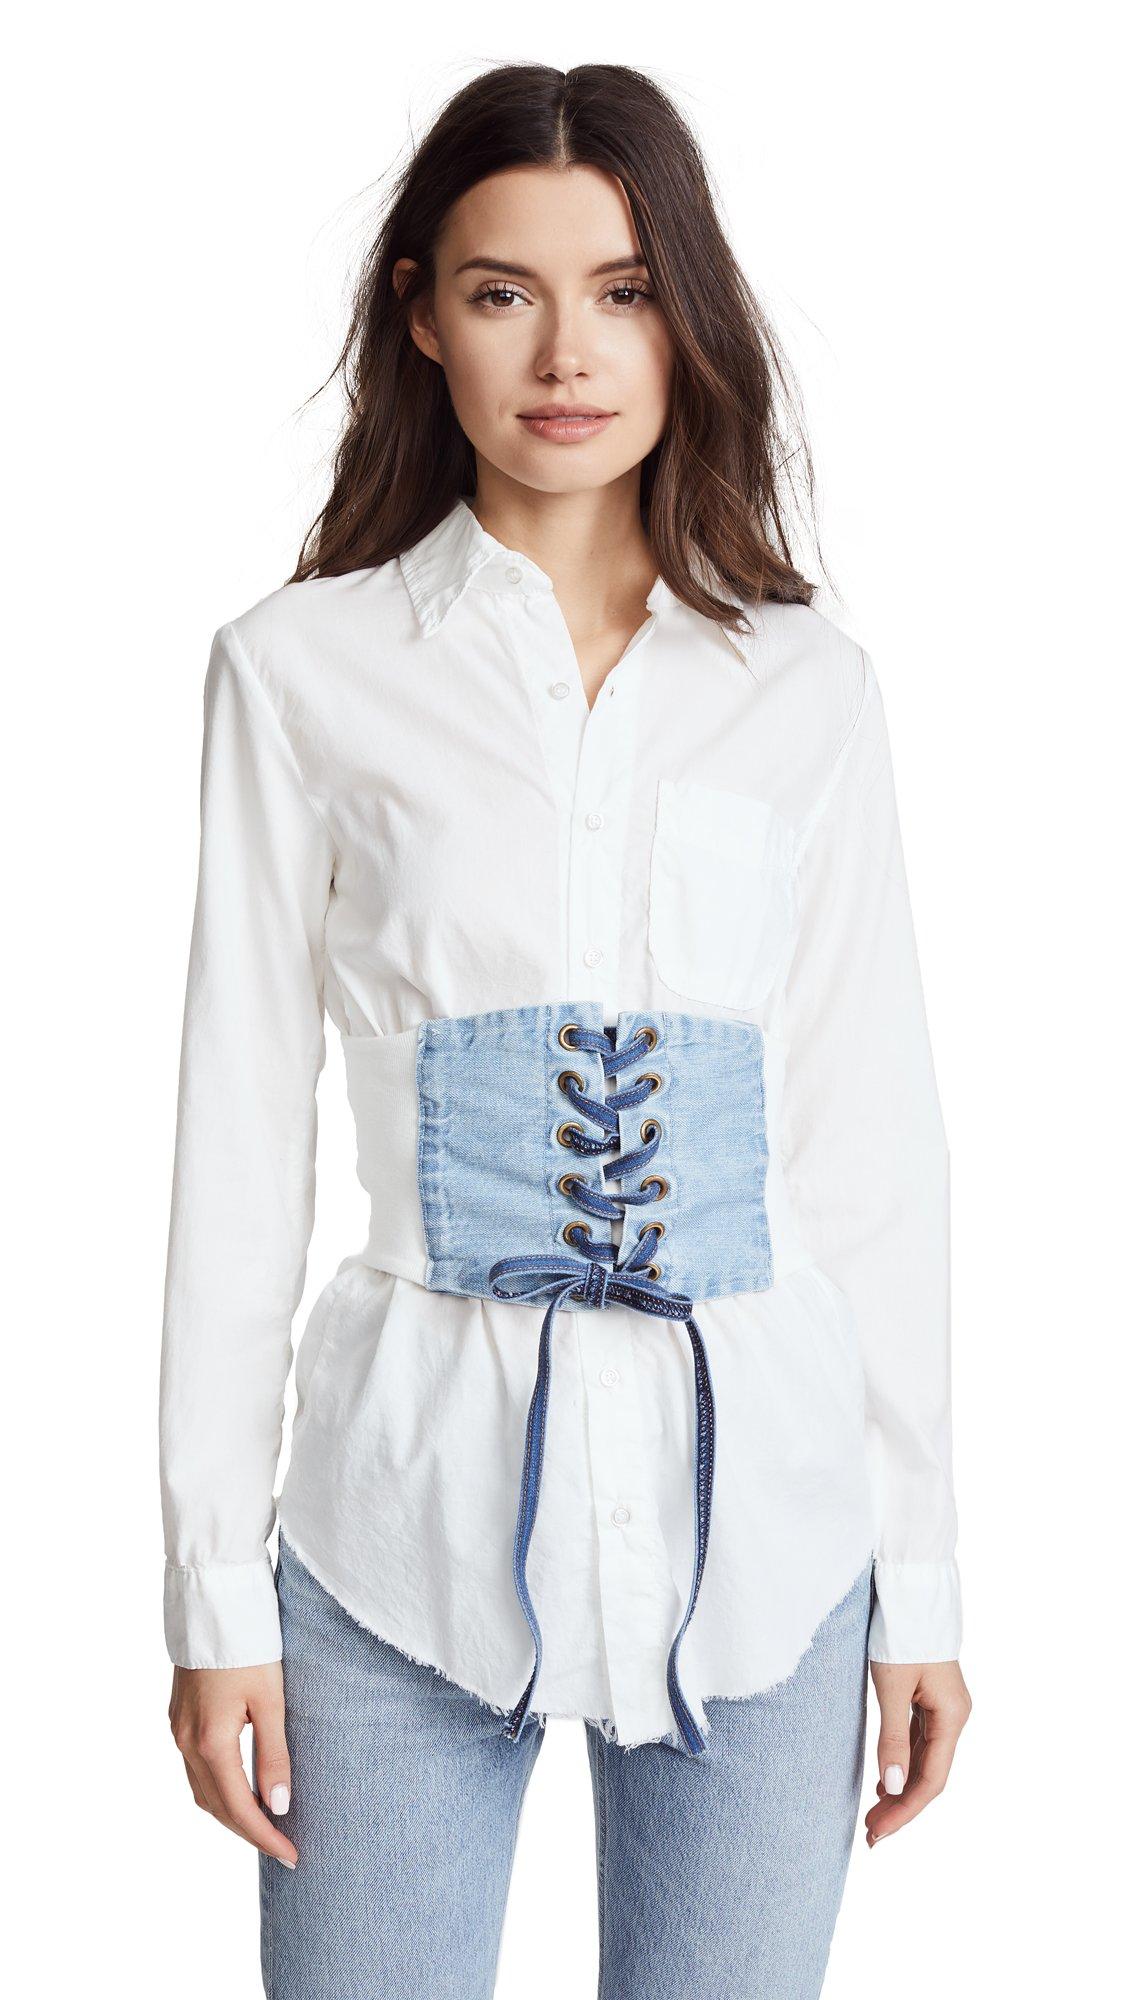 F/S N NSF Women's BOYDE Corset Top, White, Small